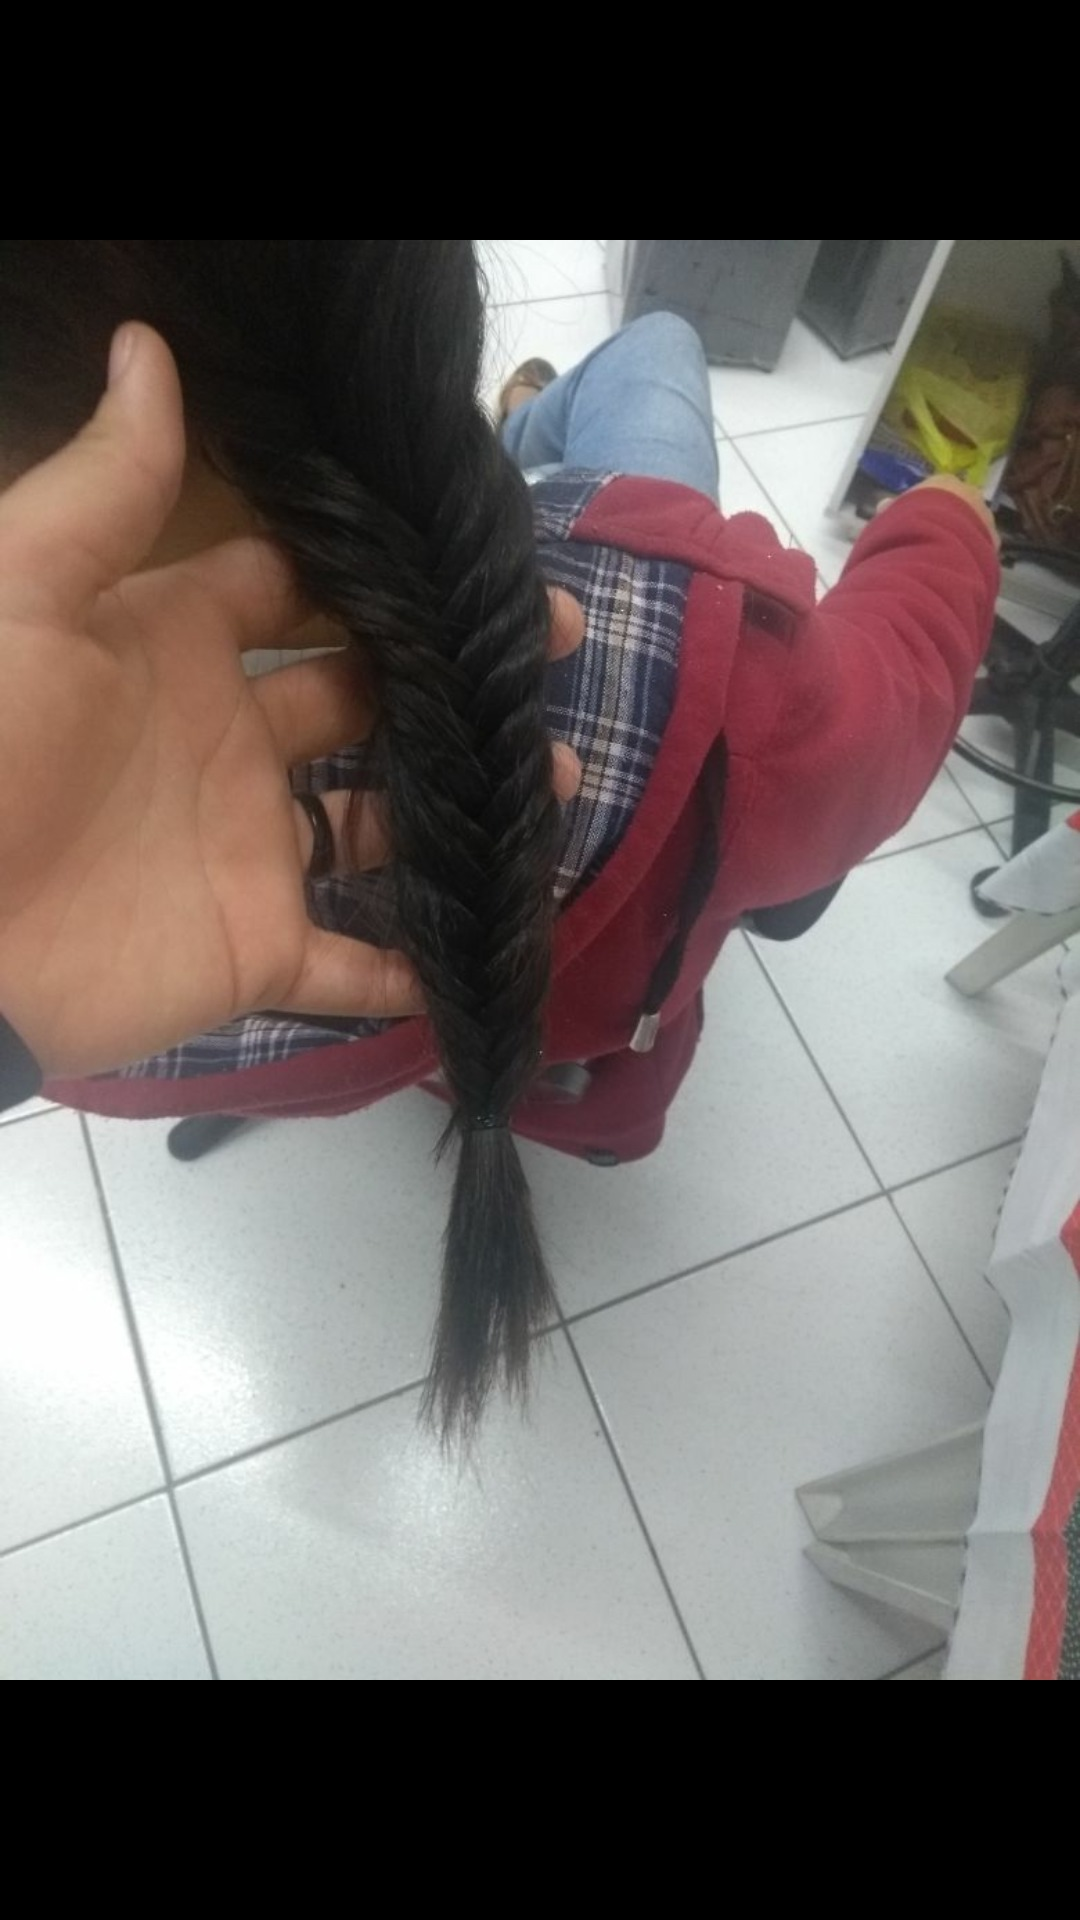 Trança escama de peixe cabelo estudante (cabeleireiro) auxiliar cabeleireiro(a)